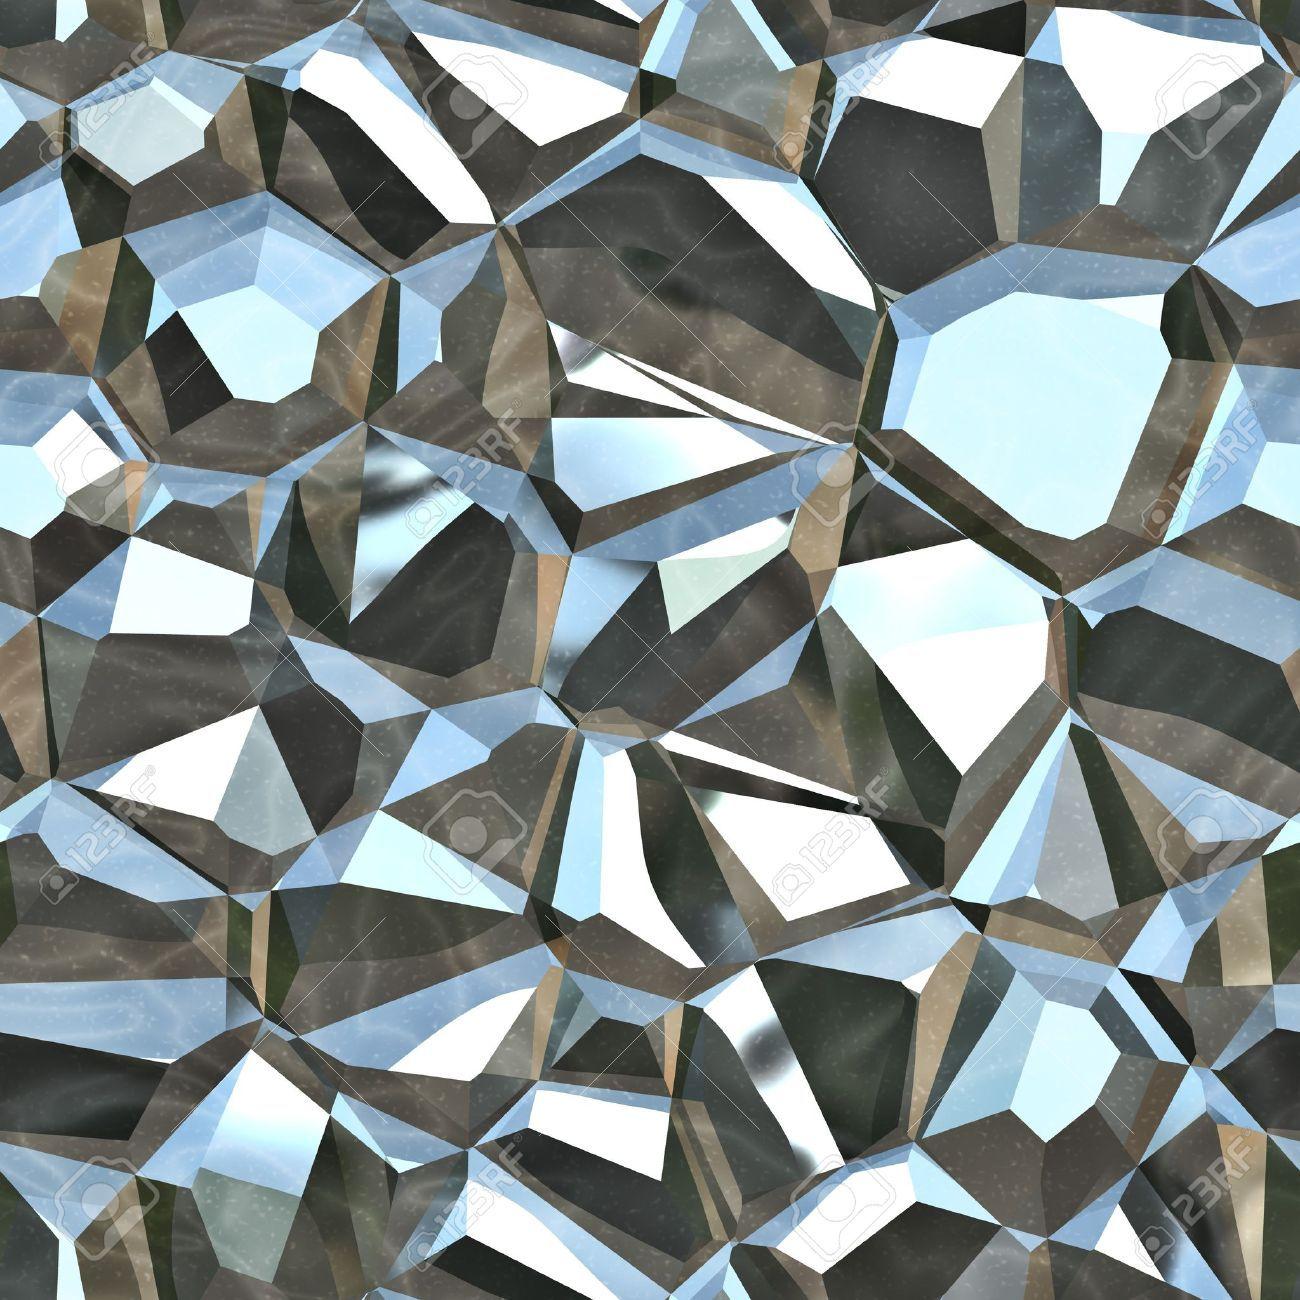 IMVU Seamless Textures Tile